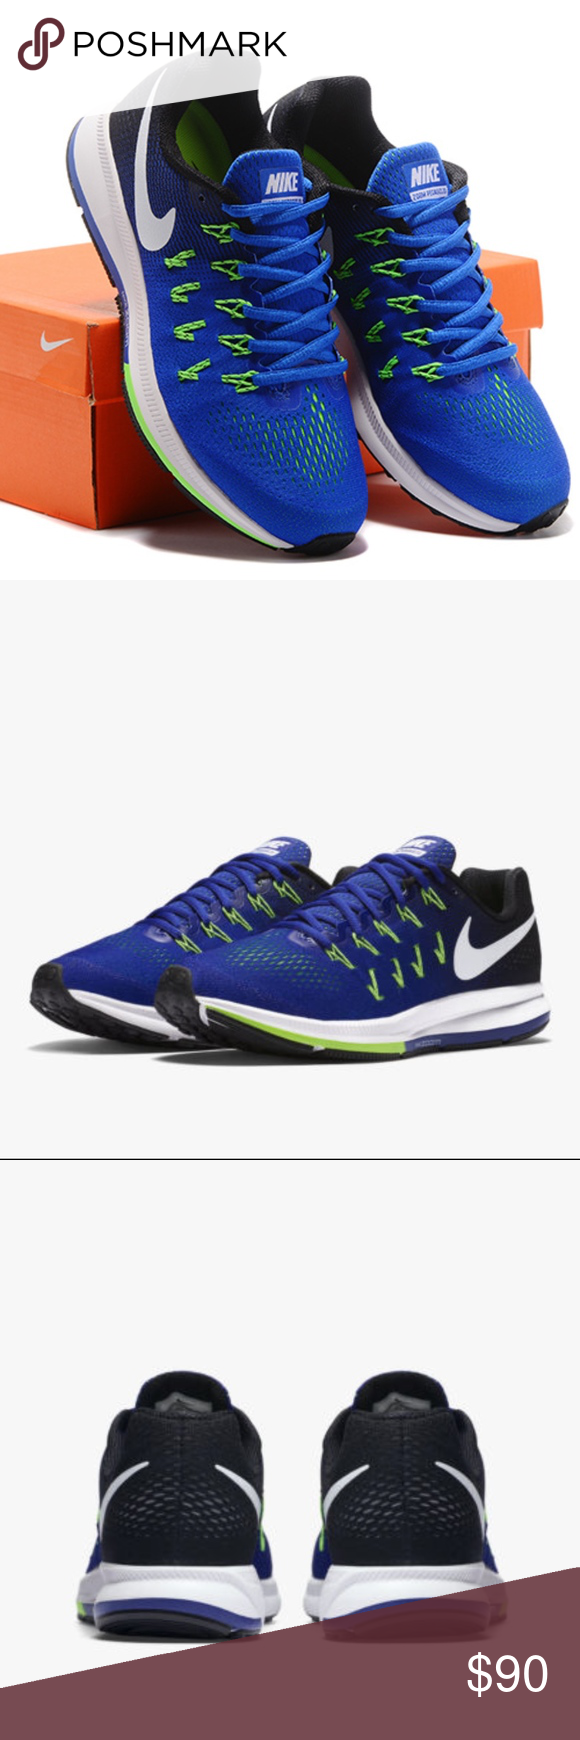 Nike Air Zoom Pegasus 33 Men S Running Shoe Running Shoes For Men Nike Air Zoom Pegasus Shoes